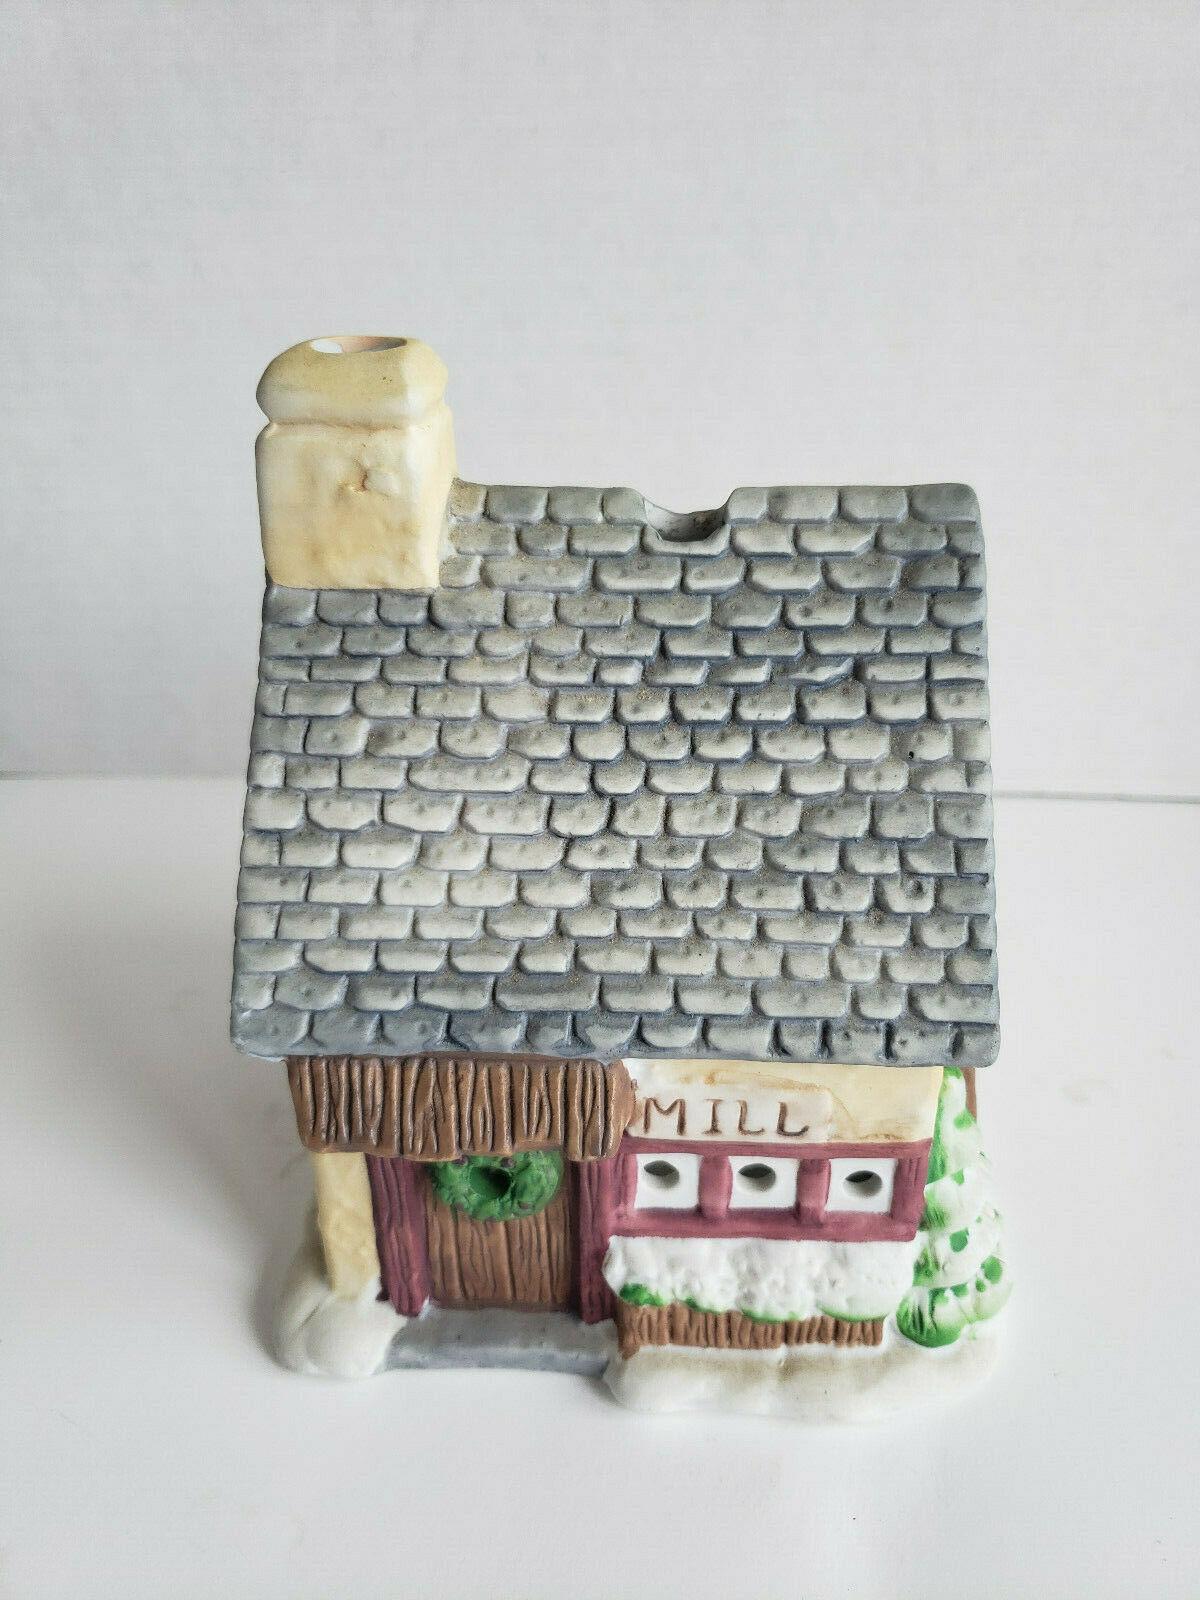 Grist Mill Tealight Candle House Porcelain Village Christmas PartyLite P0805